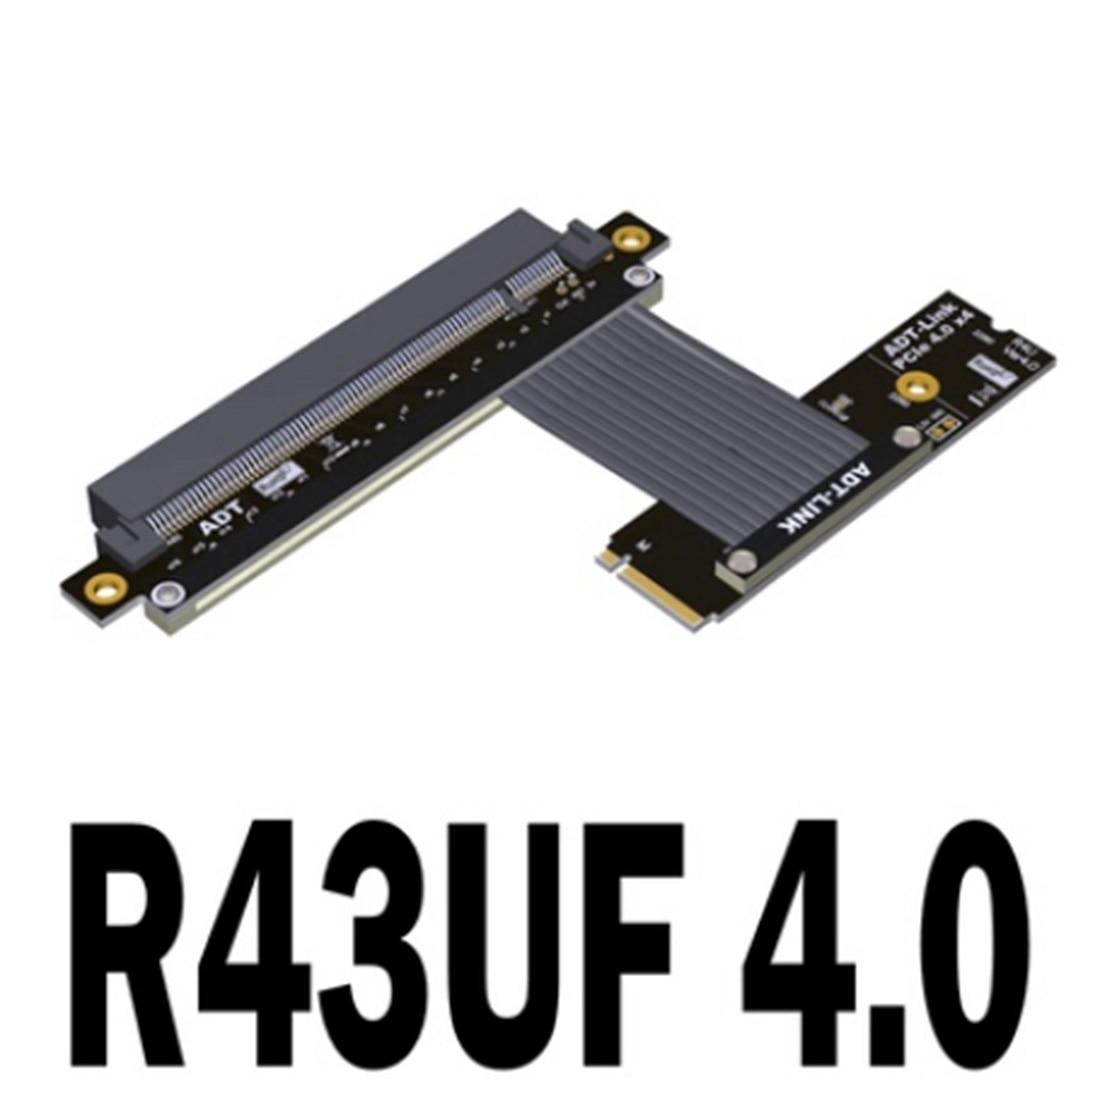 PCIE 4.0x16 كابل Riser PCI Express موسع 64Gbps ل NVMe M.2 SSD GPU بطاقة الرسومات الفيديو مع كابل الطاقة Sata R43U سلسلة